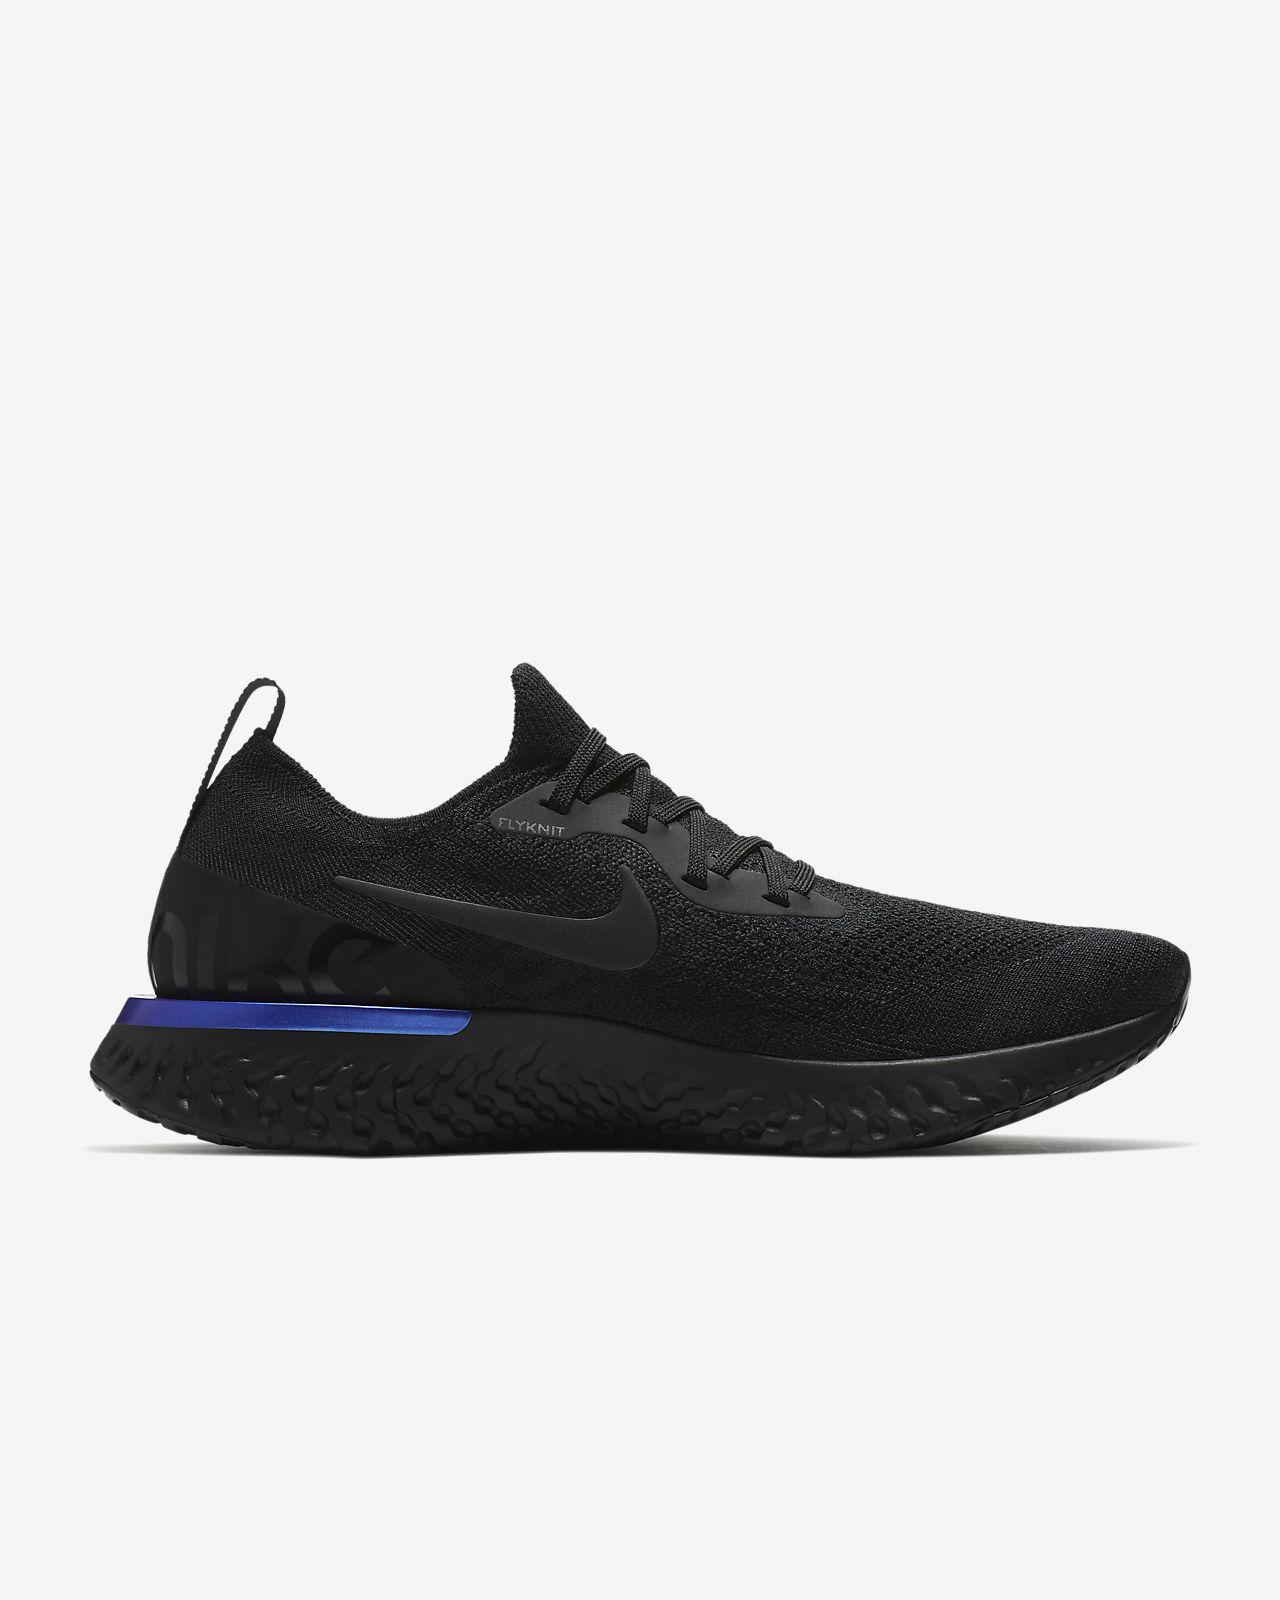 Nike Epic React Flyknit Herren-Laufschuh Herren-Laufschuh Herren-Laufschuh Sparen Sie über 50%-AR1536DS   3fafd1